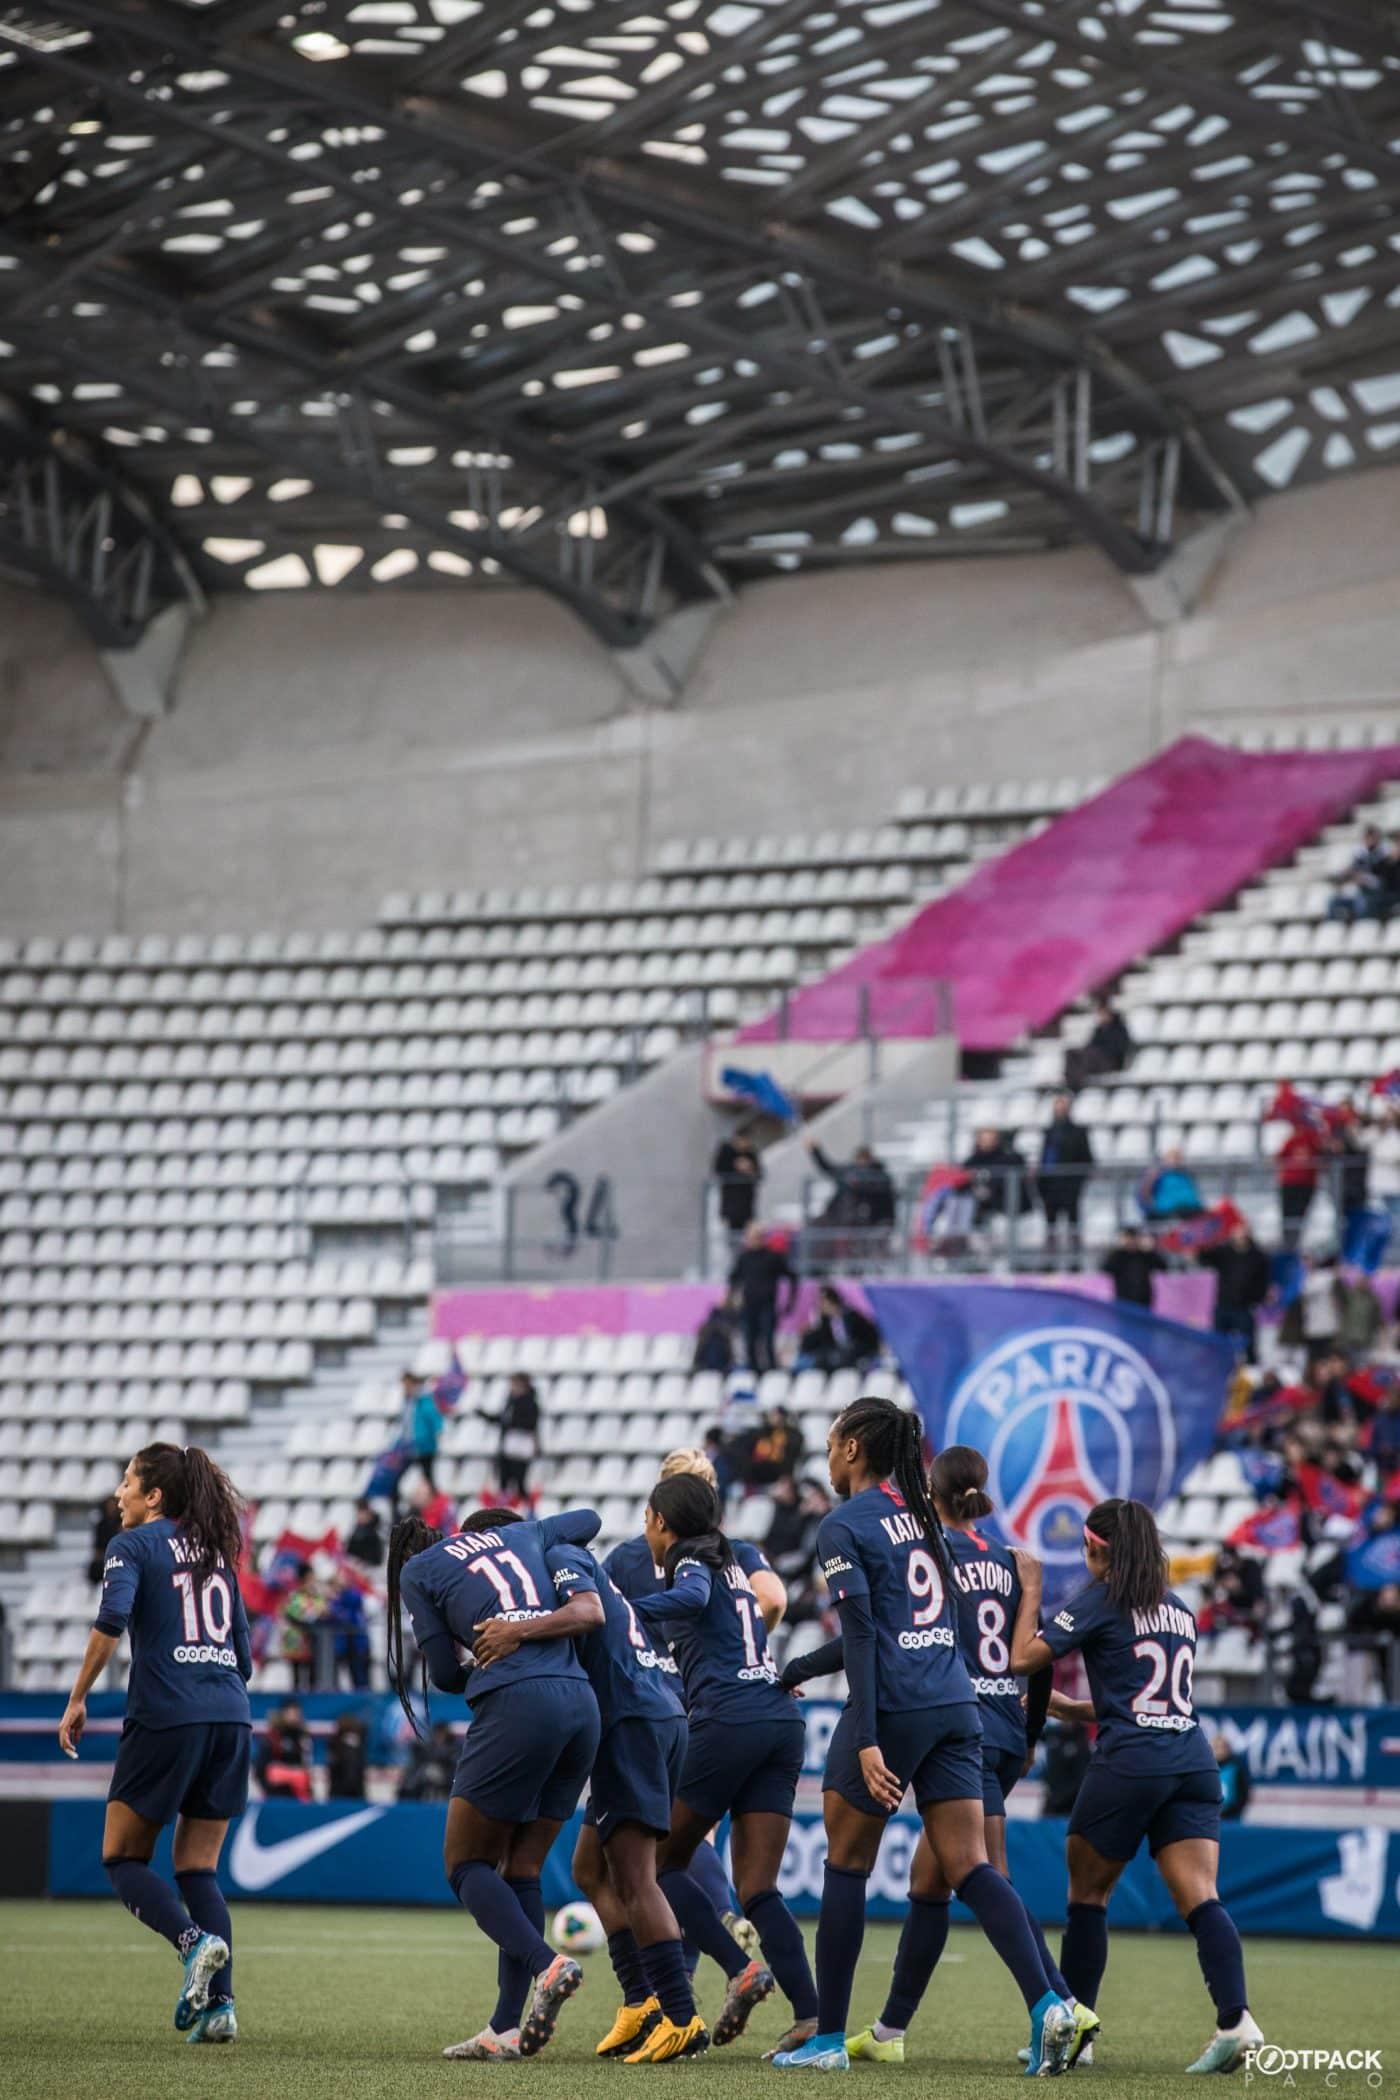 au-stade-paris-saint-germain-psg-olympique-de-marseille-d1-feminine-arkema-footpack-21